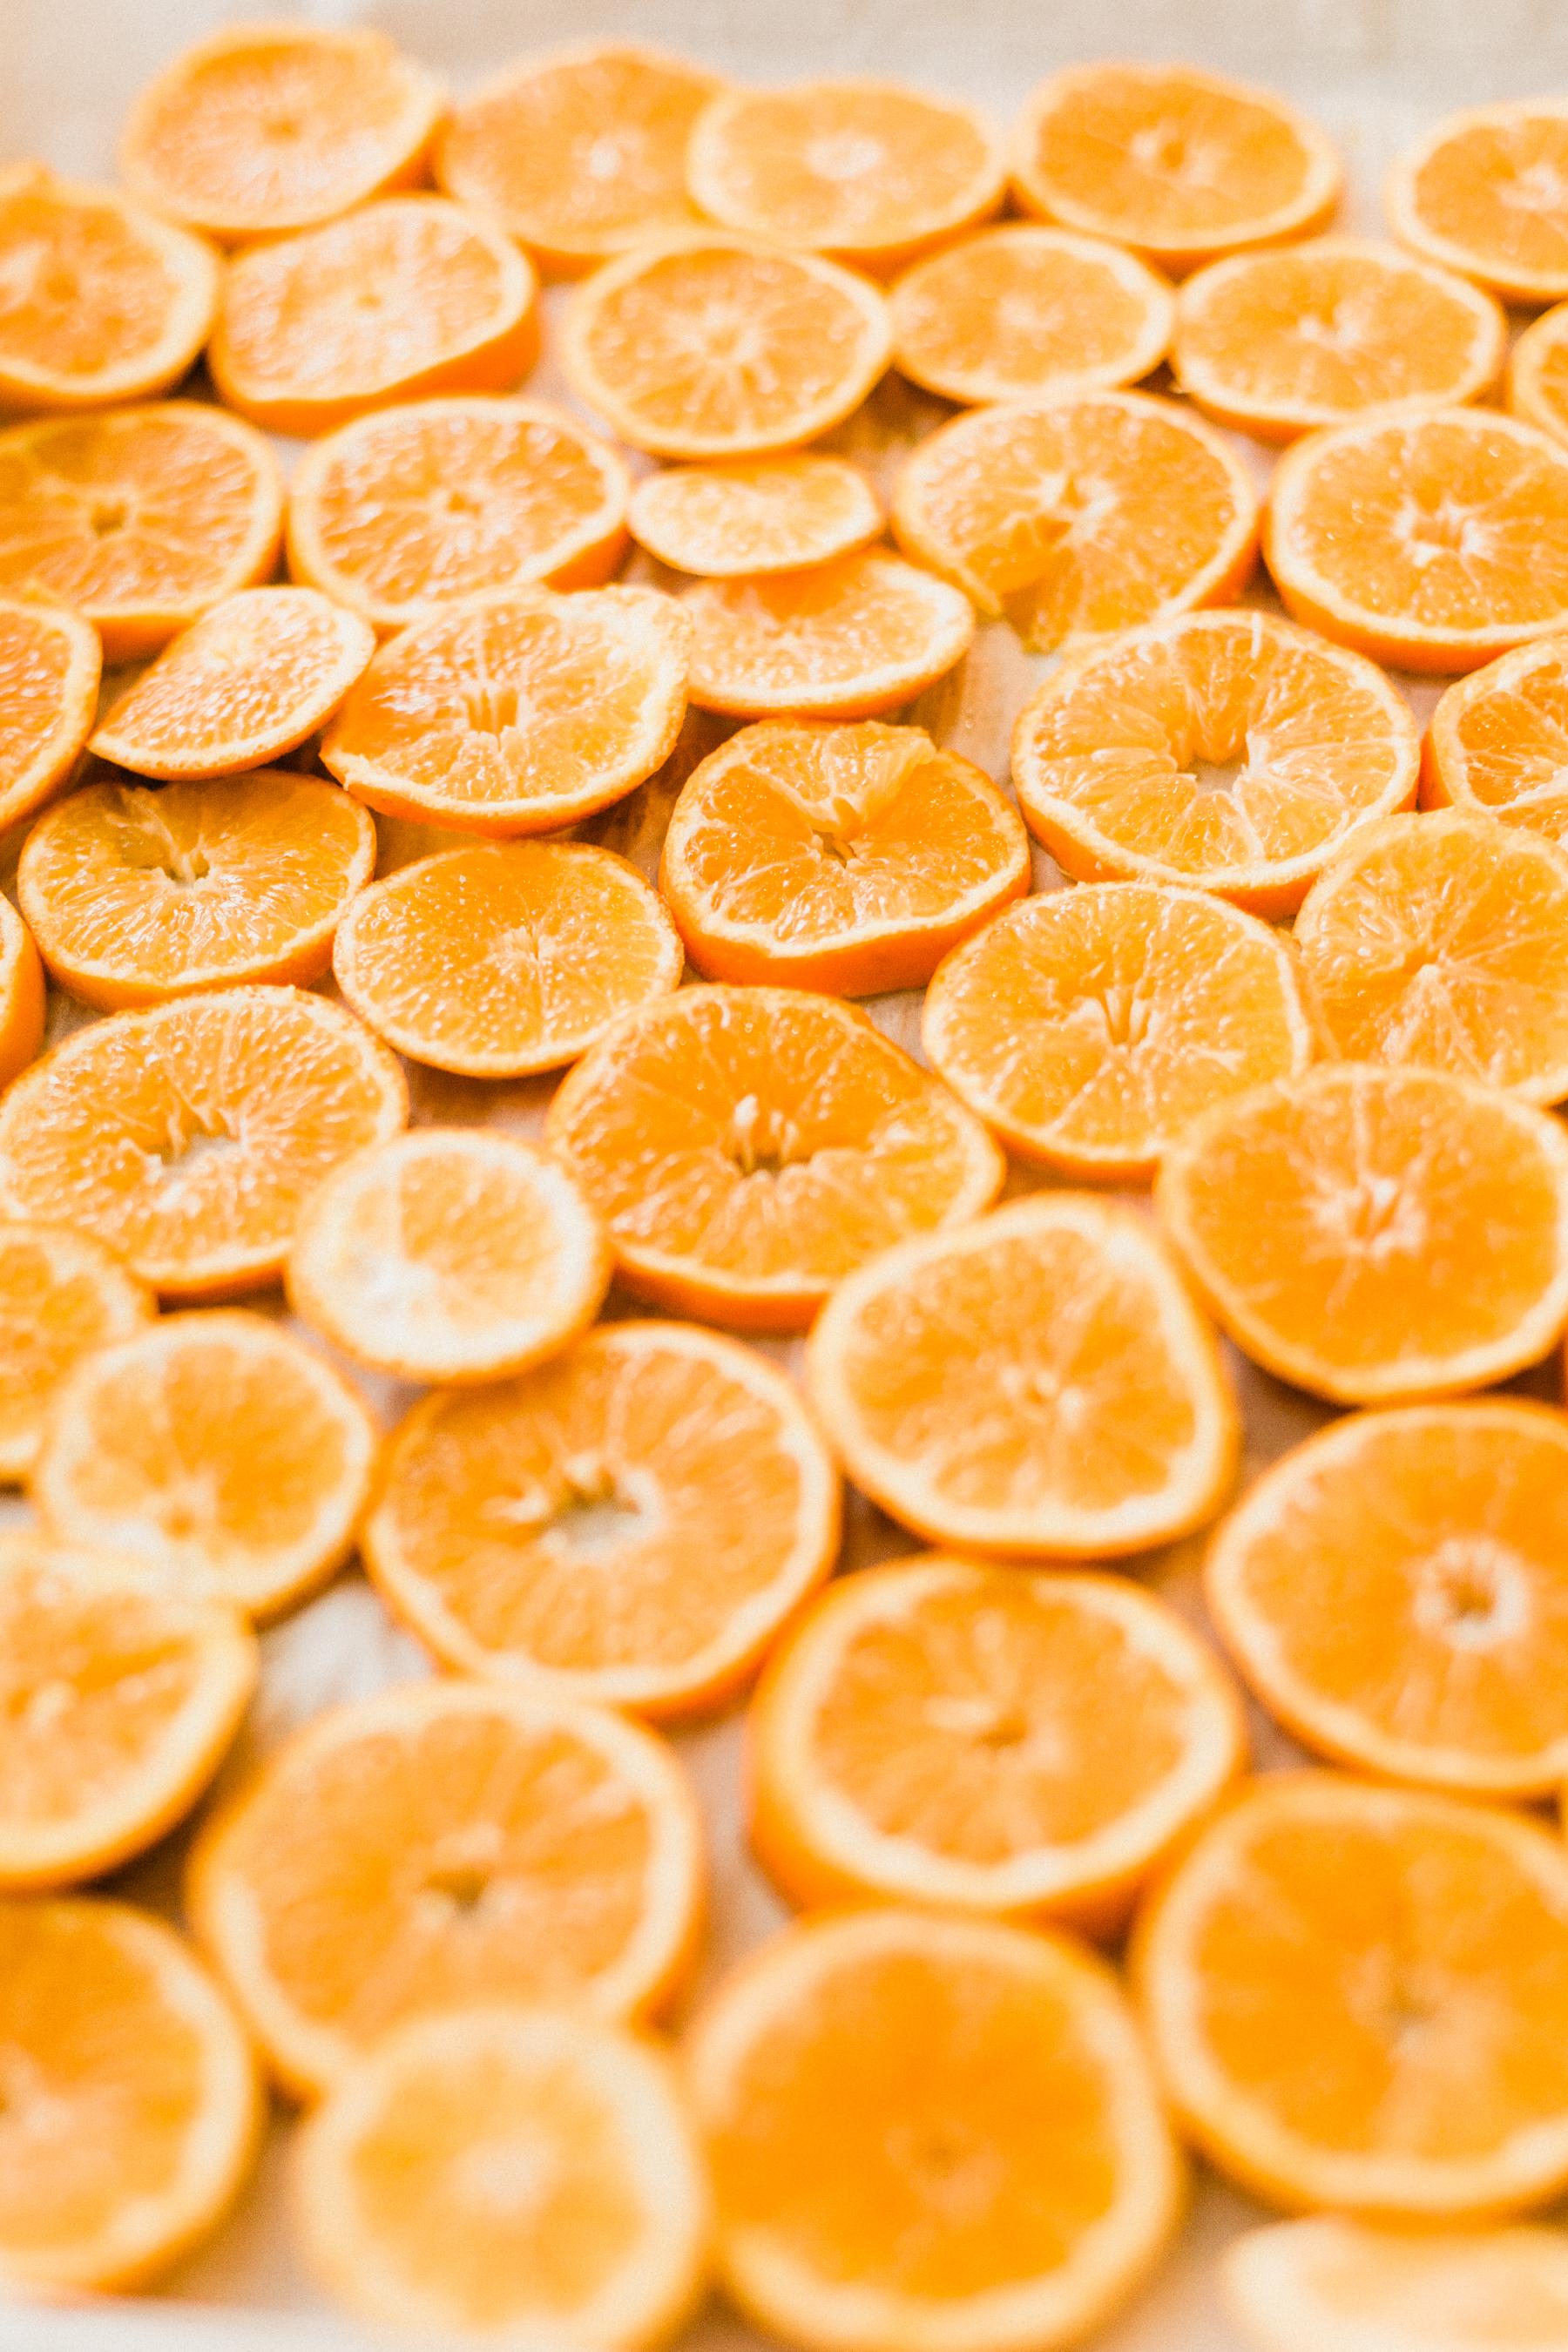 Oranges-13.jpg